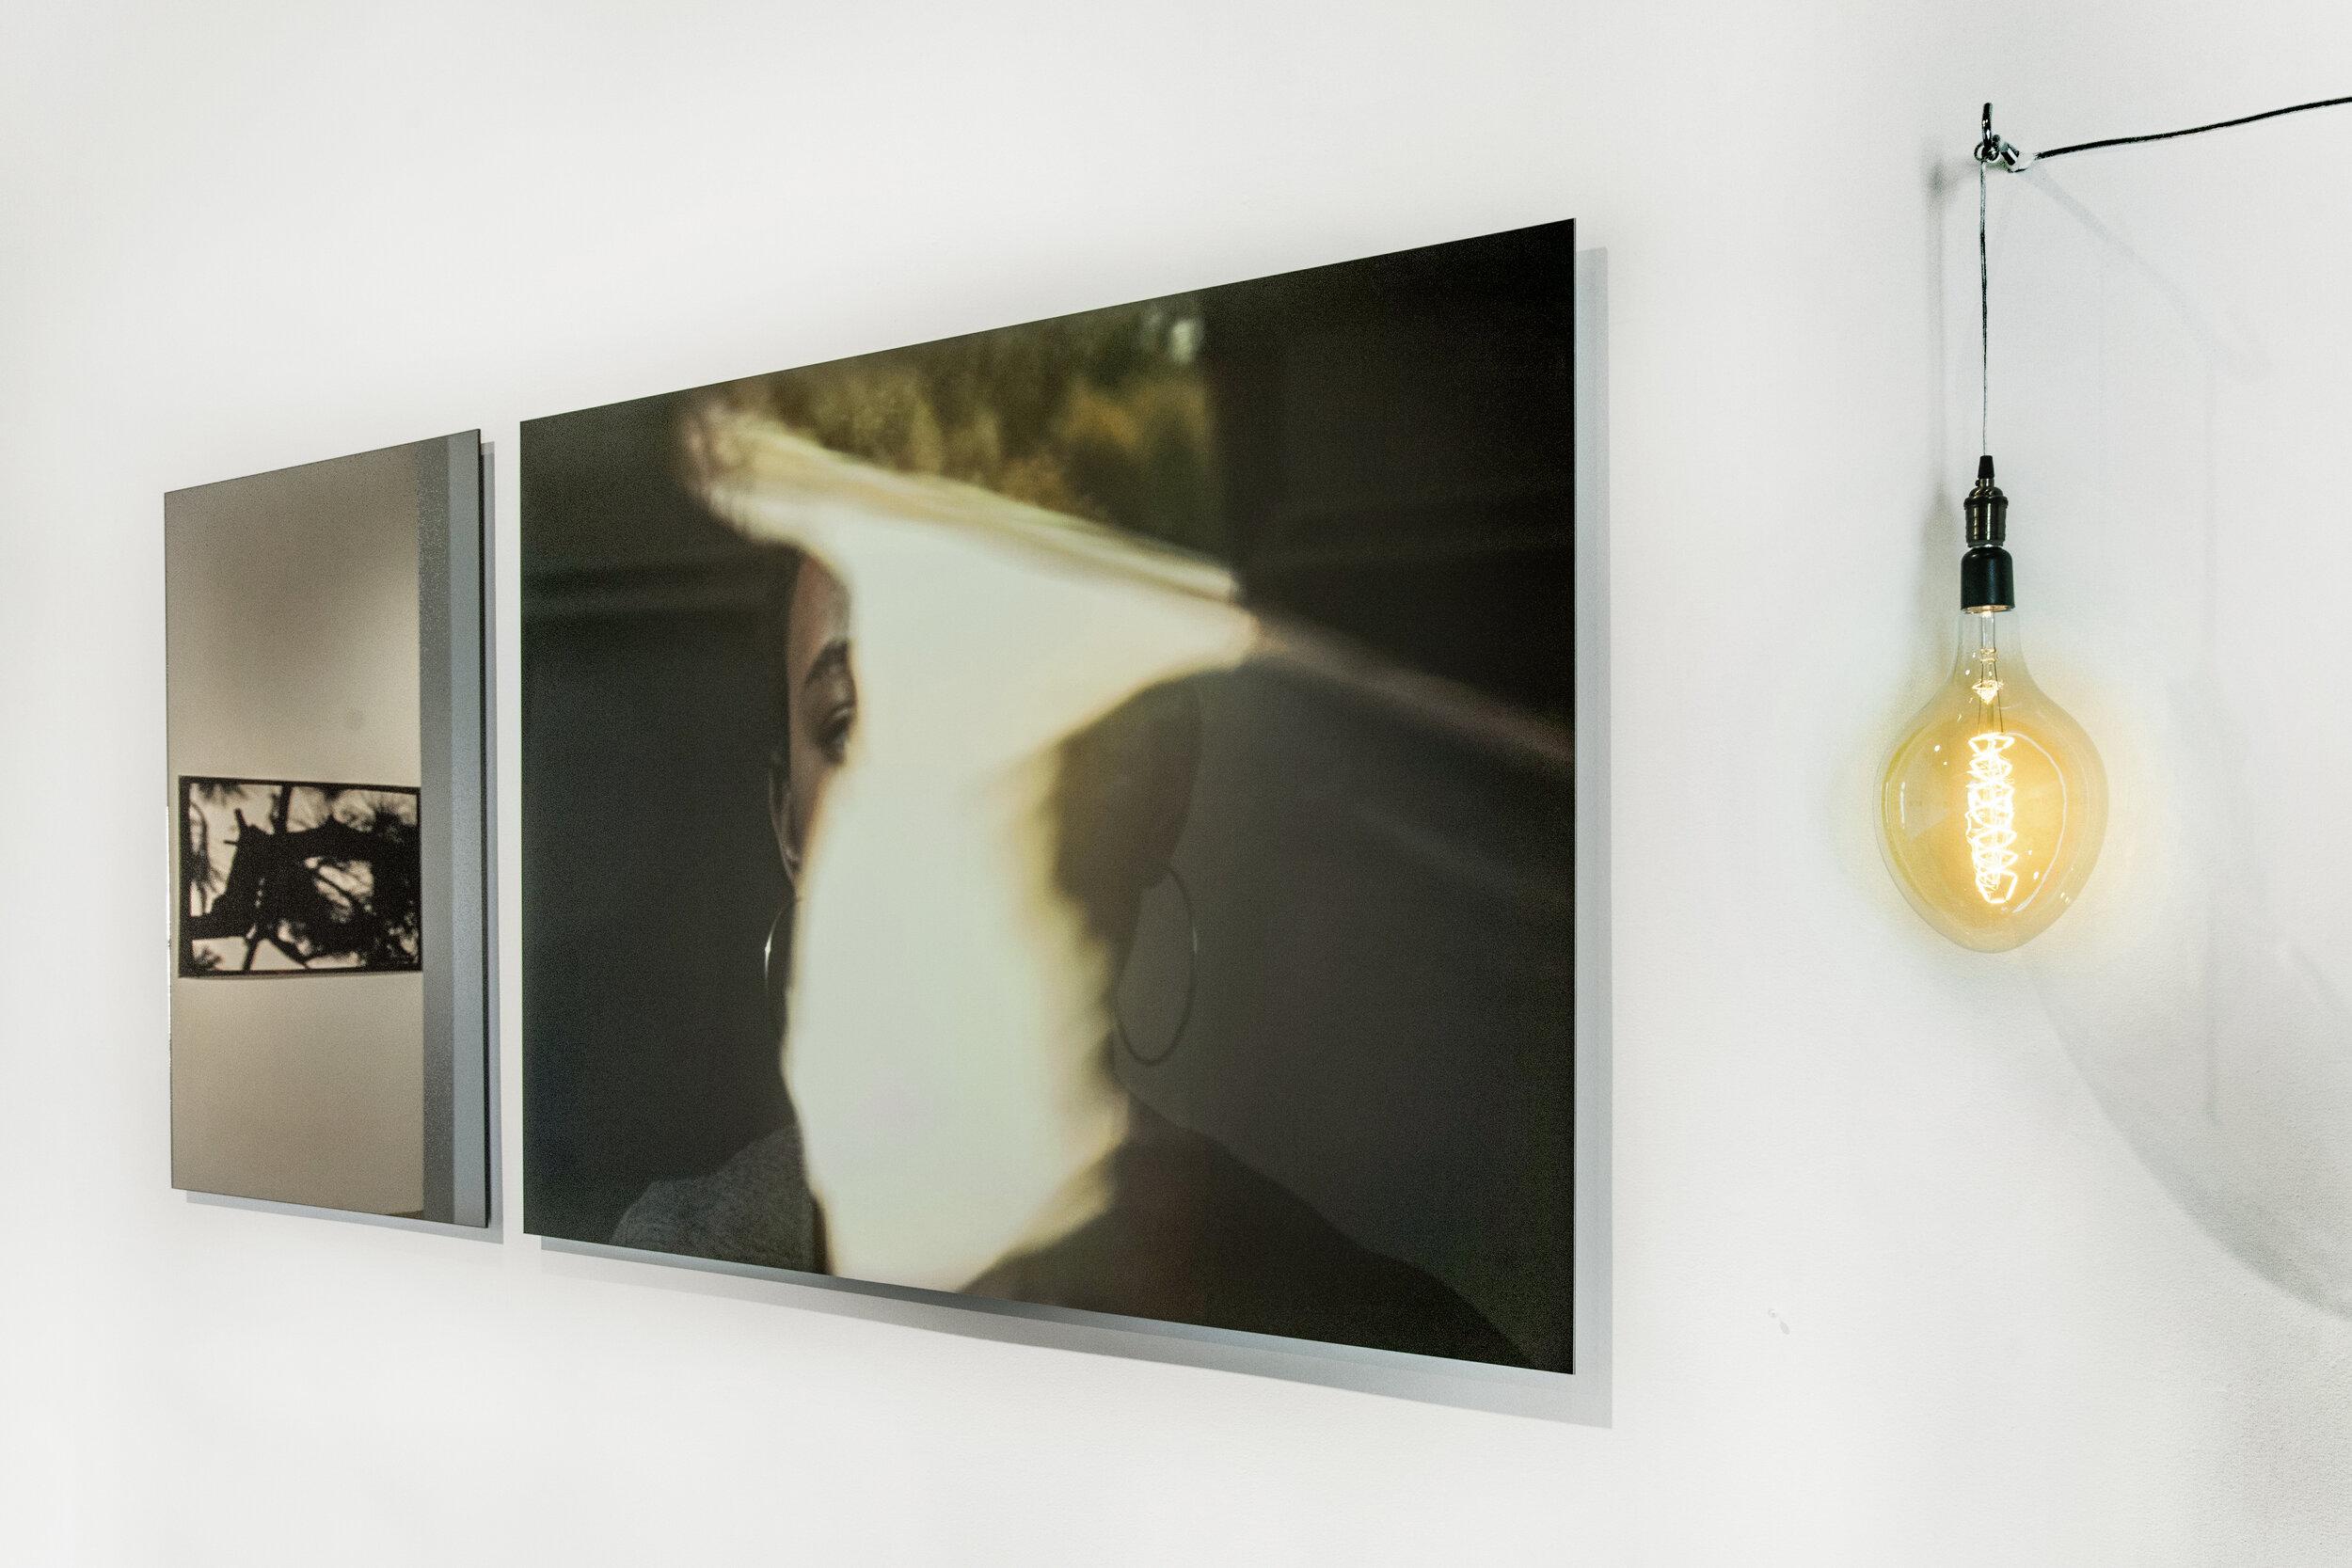 Triptych Sorhan , Bronze mirror 34x47in, Gyclee print on dibond, 65x34in, light bulb, 2018